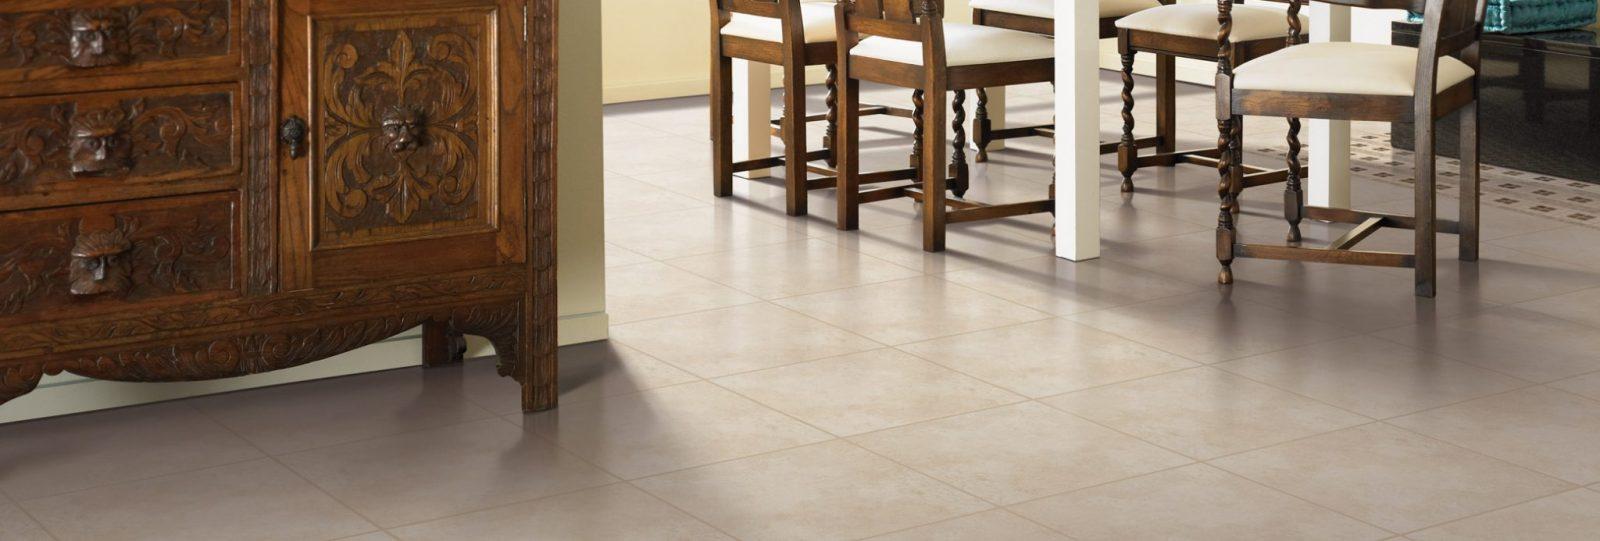 tile flooring header